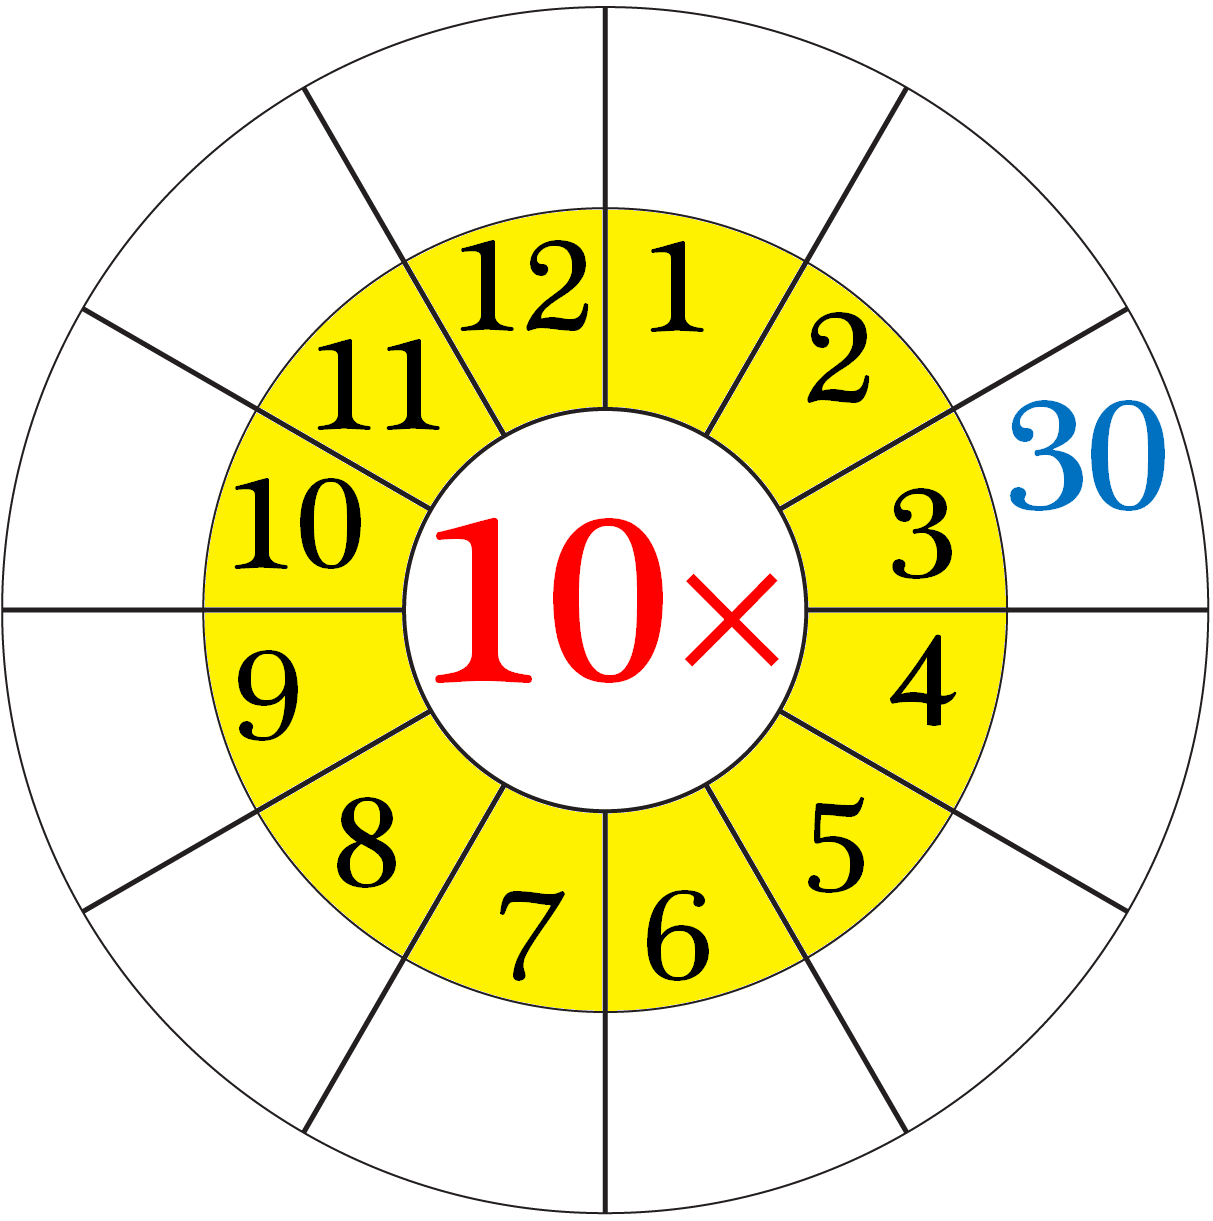 Worksheet on Multiplication Table of 10